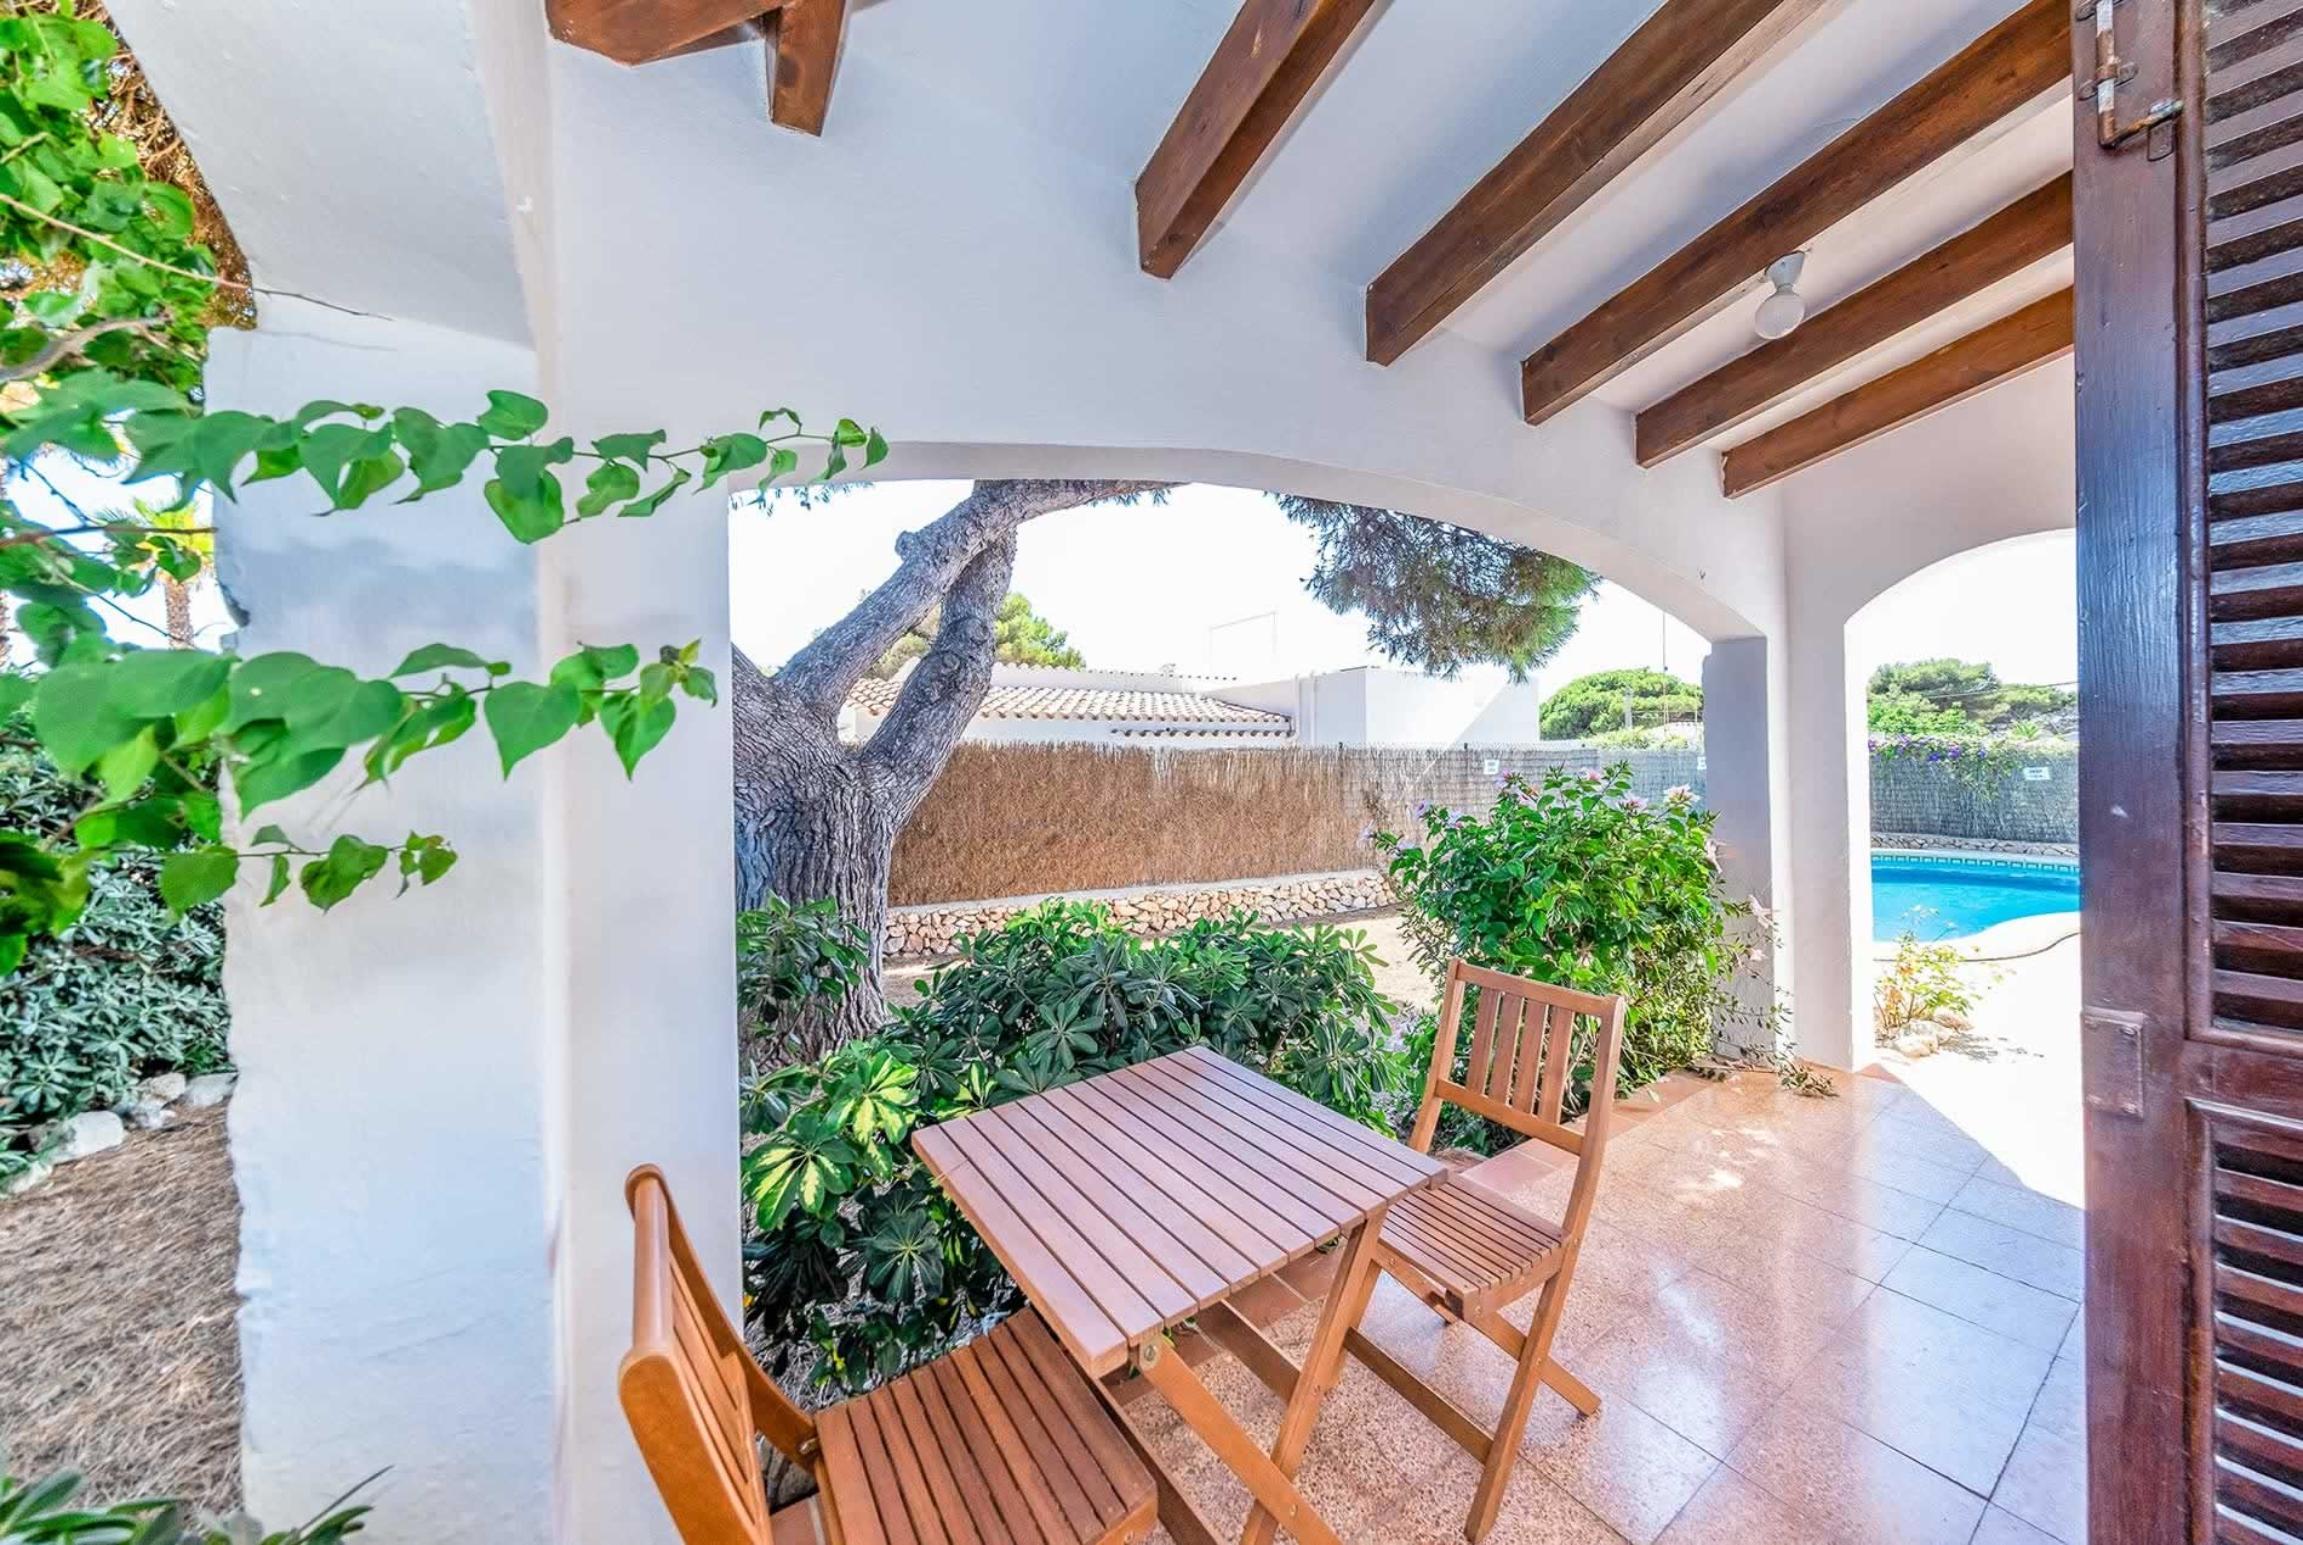 Ferienhaus Iris Prima (2653680), Punta Prima, Menorca, Balearische Inseln, Spanien, Bild 4